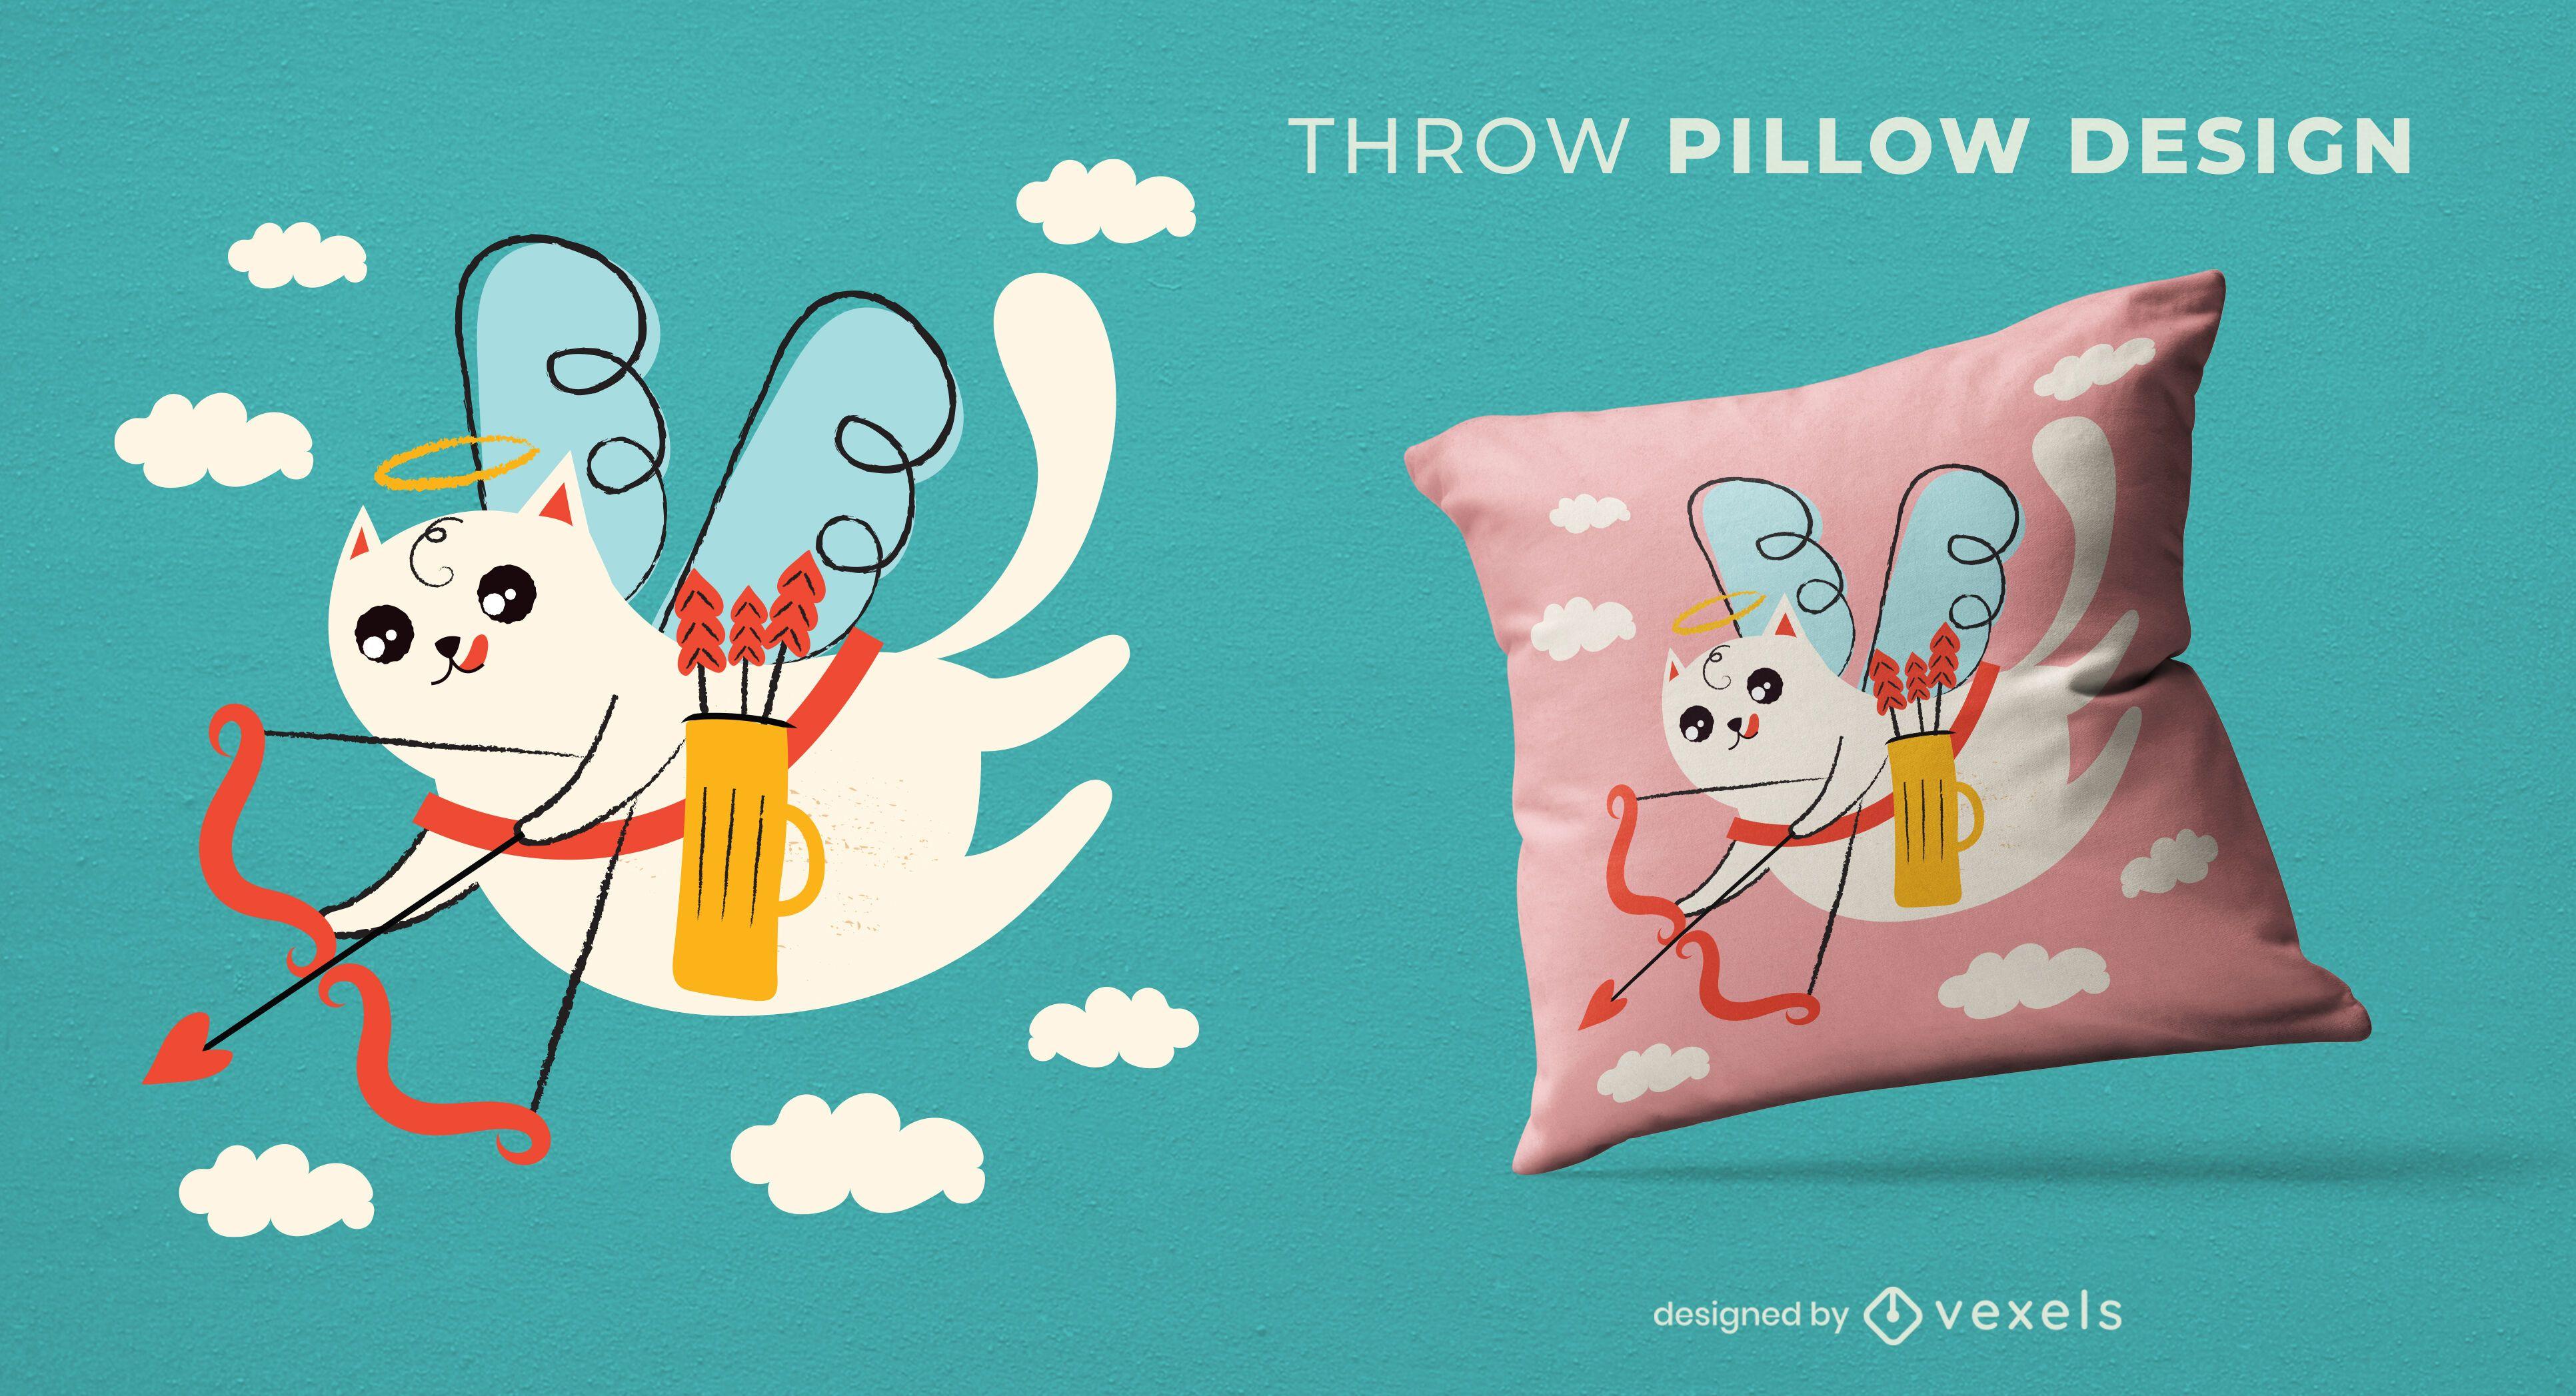 Design de almofada para gatos para o dia dos namorados